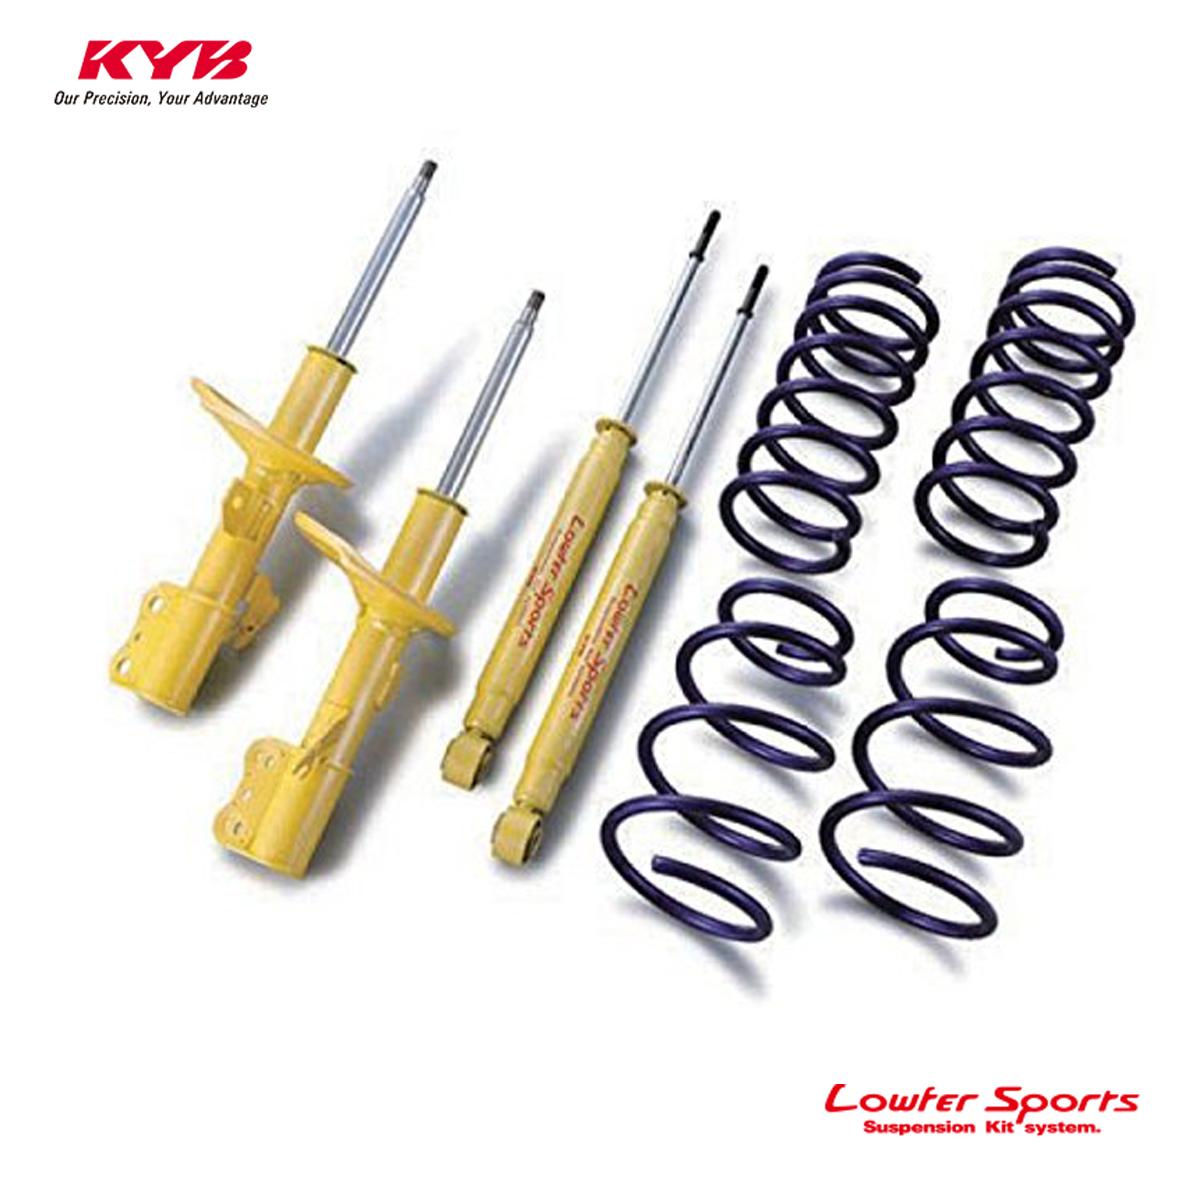 KYB カヤバ プリメーラワゴン WRP12 ショックアブソーバー サスペンションキット Lowfer Sports LKIT-WRP12 配送先条件有り